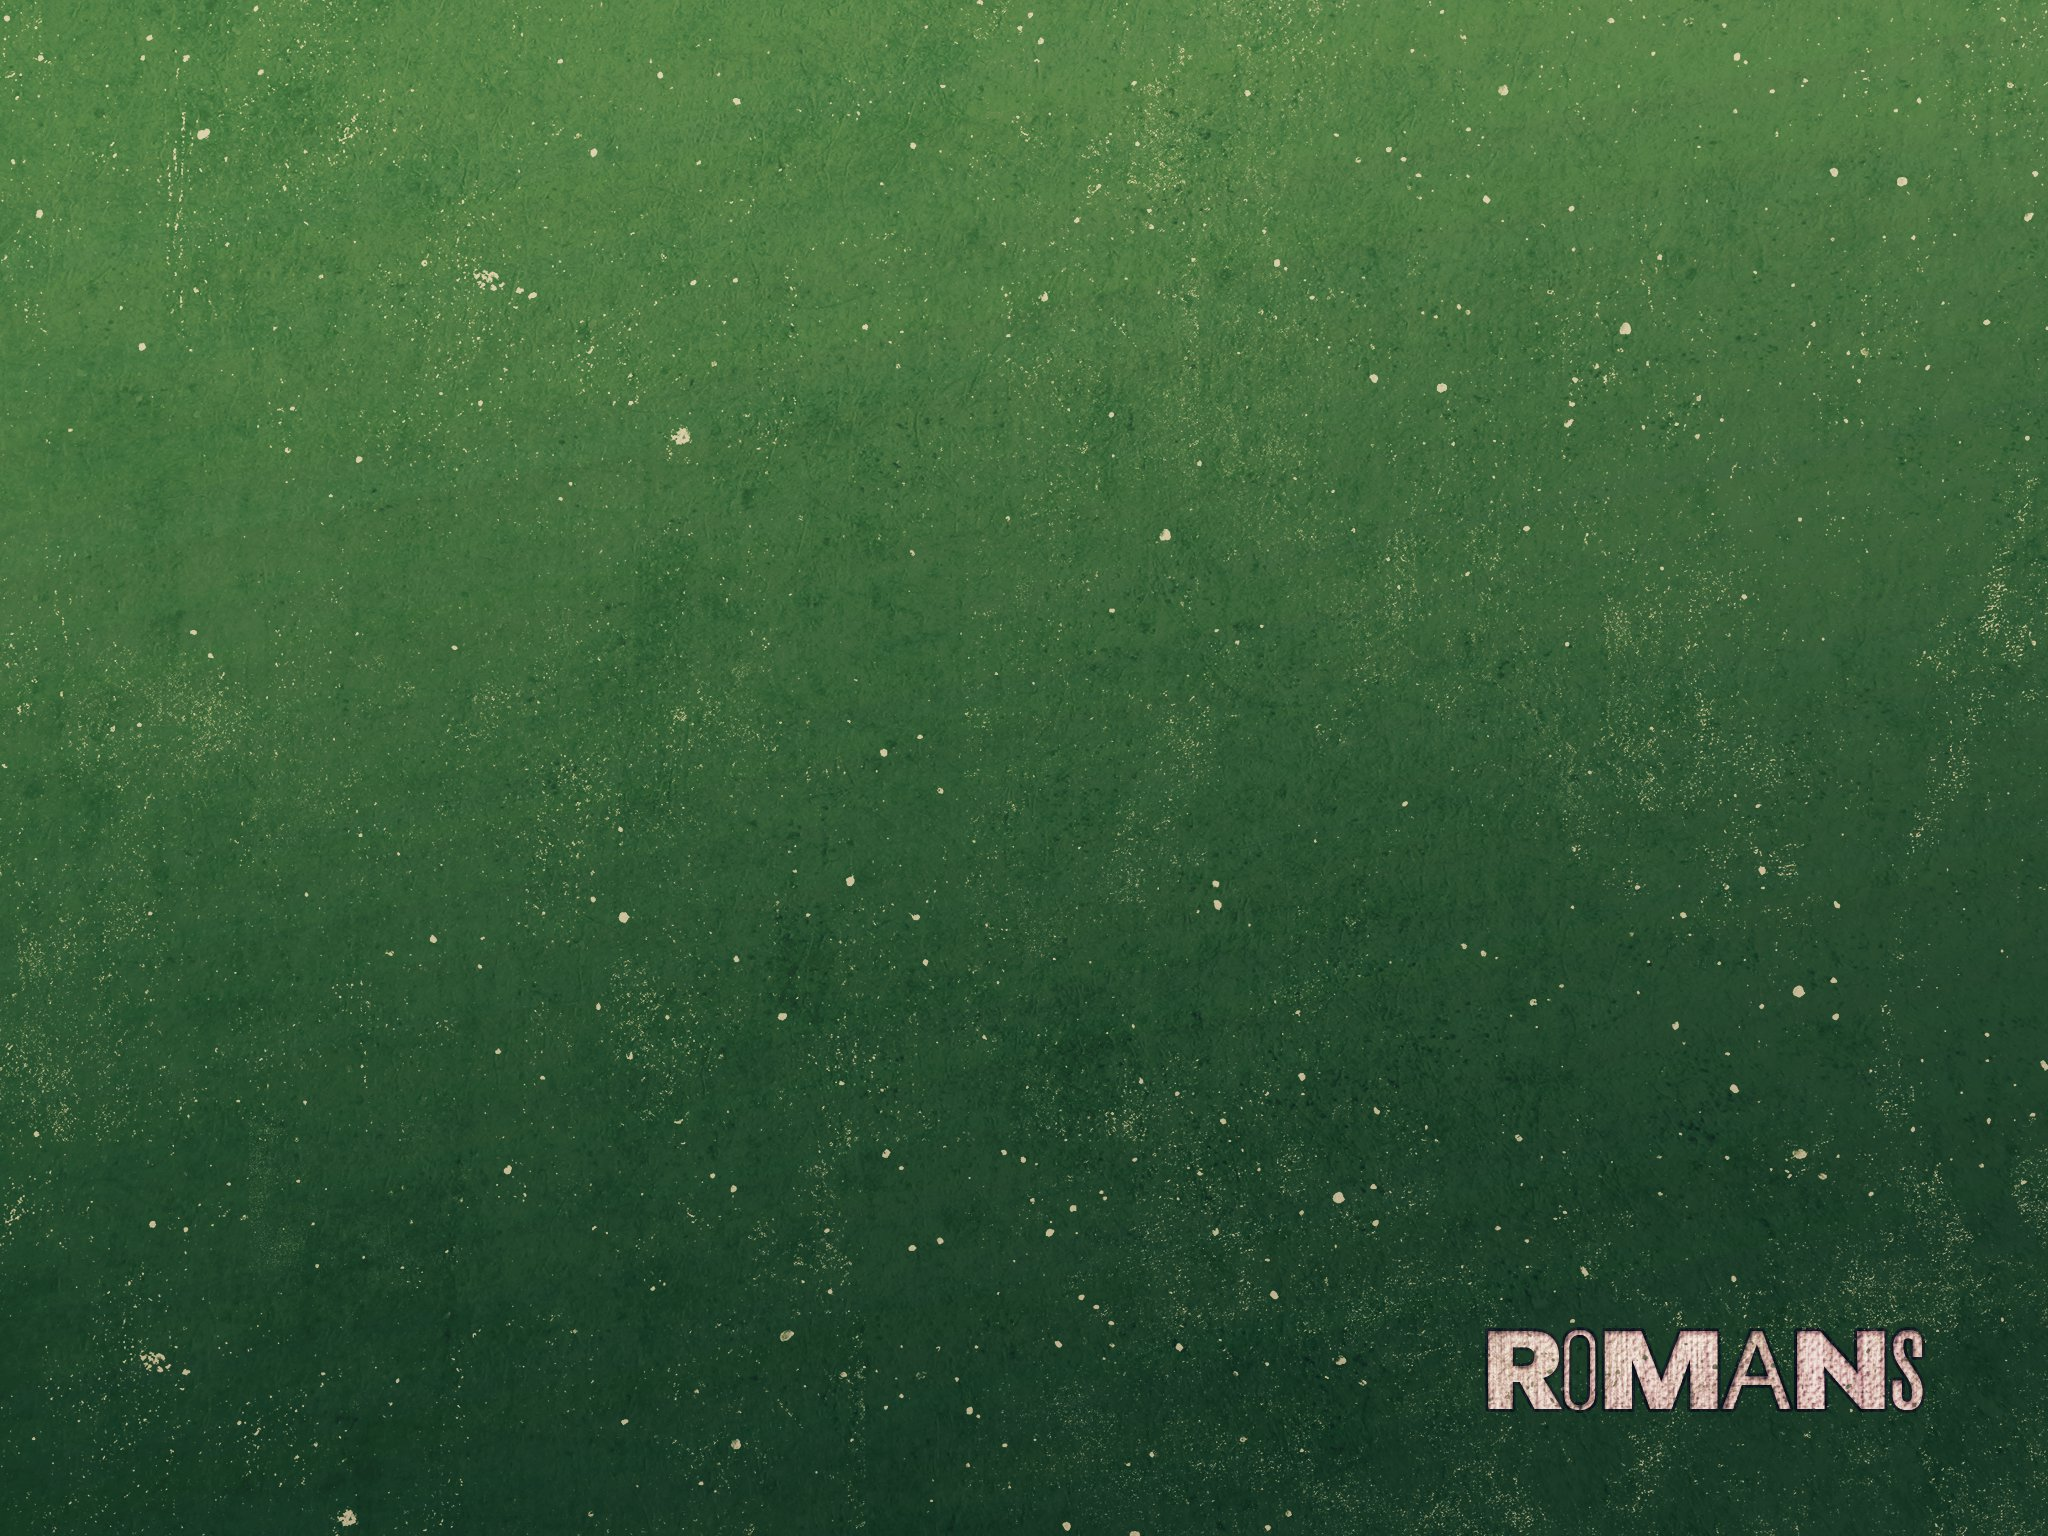 45-Romans_Secondary_4x3-fullscreen.jpg